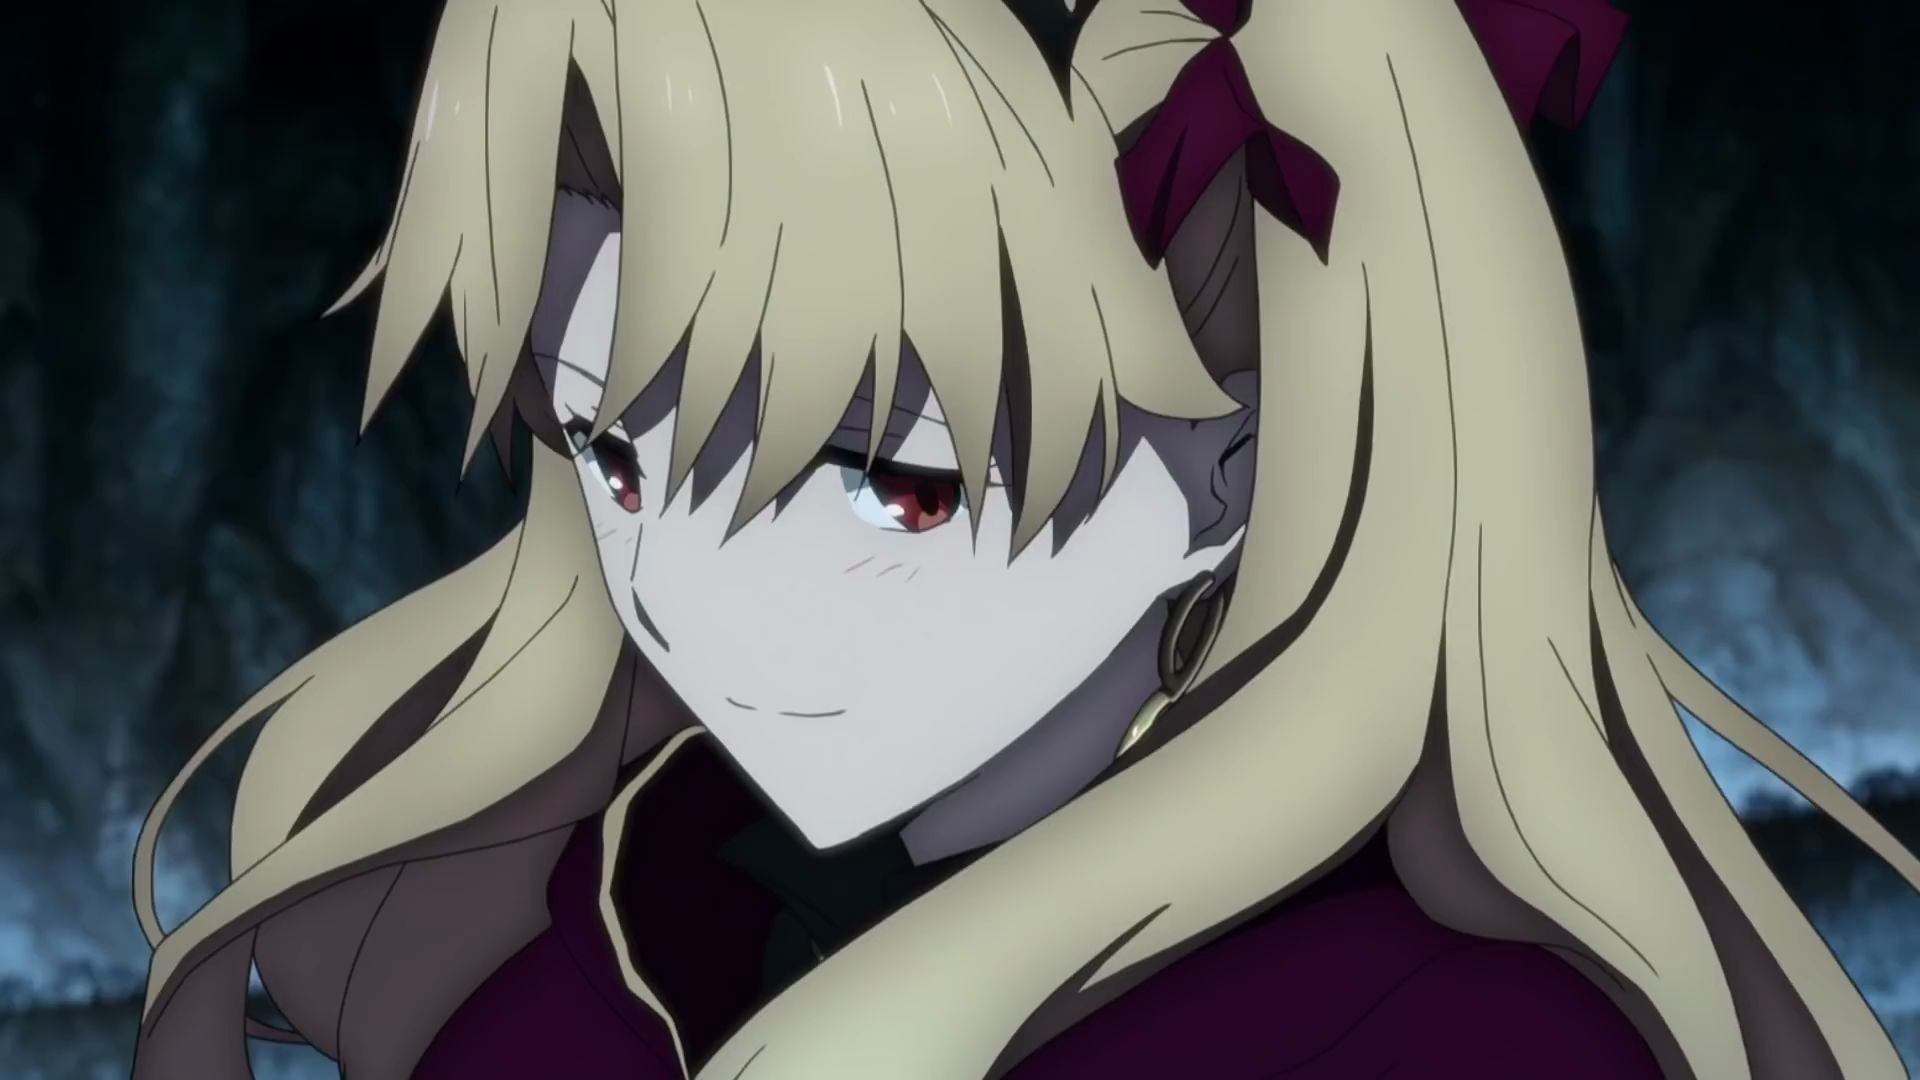 TV动画《Fate/Grand Order 绝对魔兽战线 巴比伦尼亚》特别映像「Tell me」- m.chinavegors.com